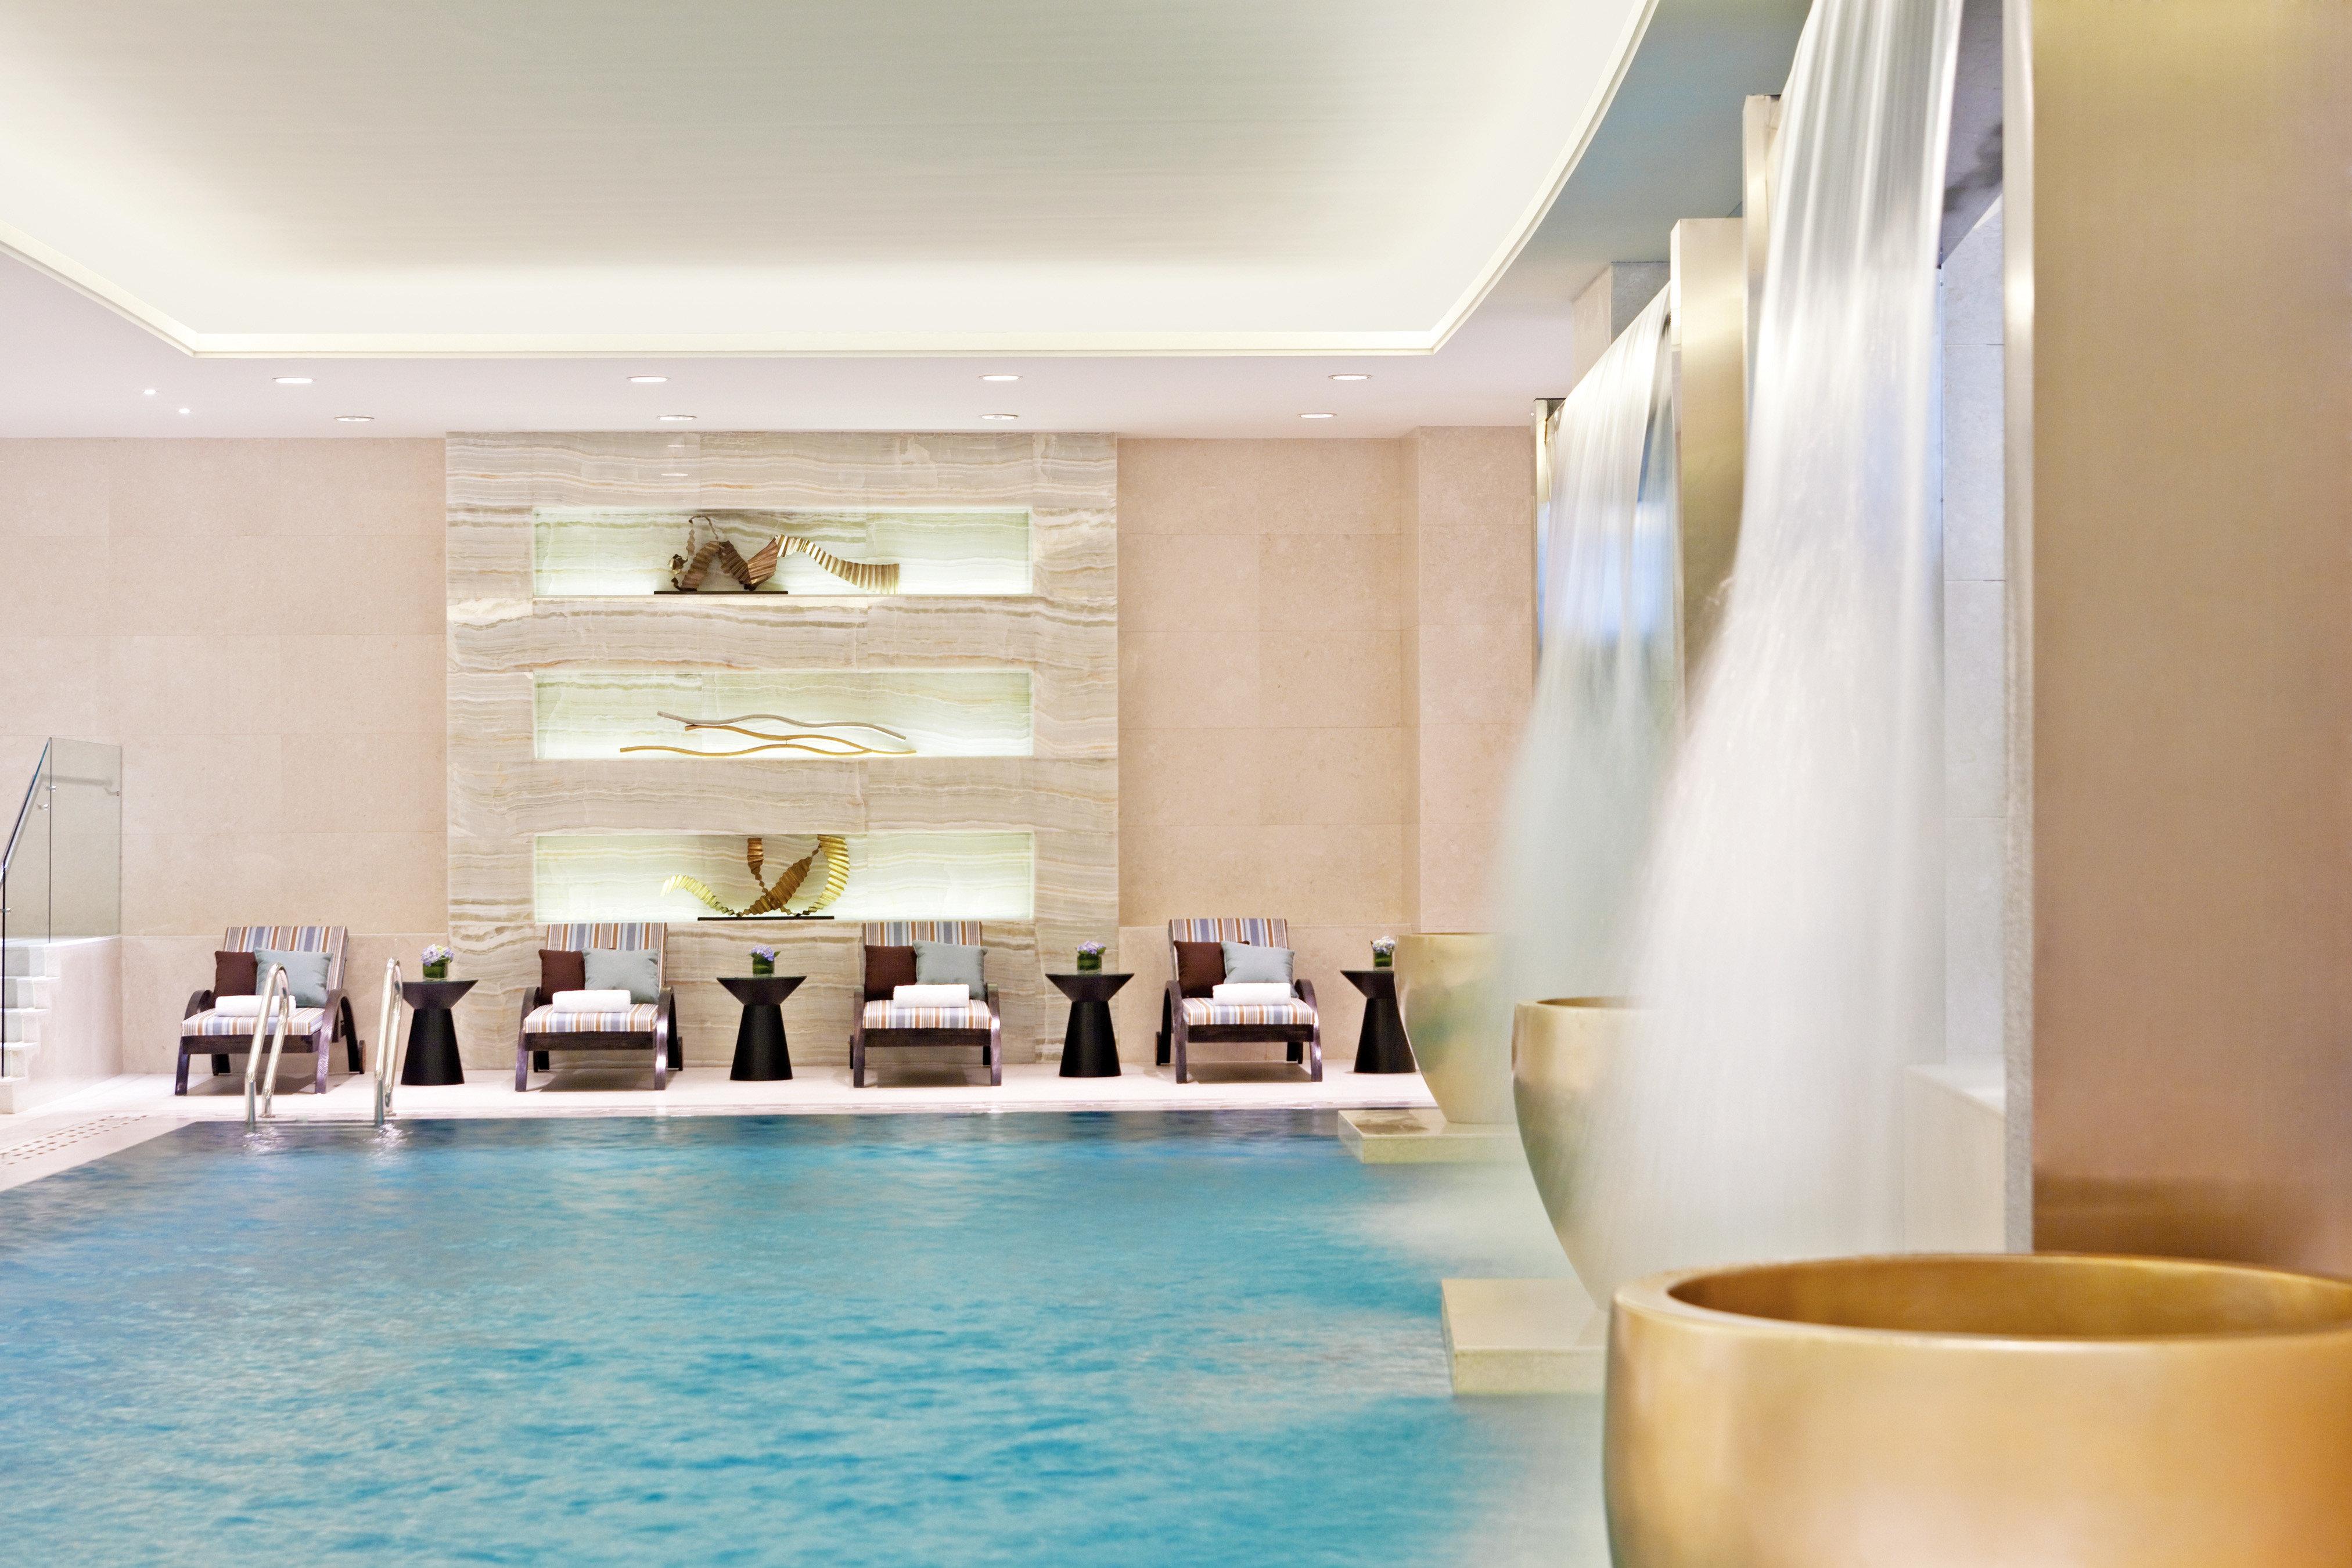 Lounge Luxury Pool swimming pool property condominium